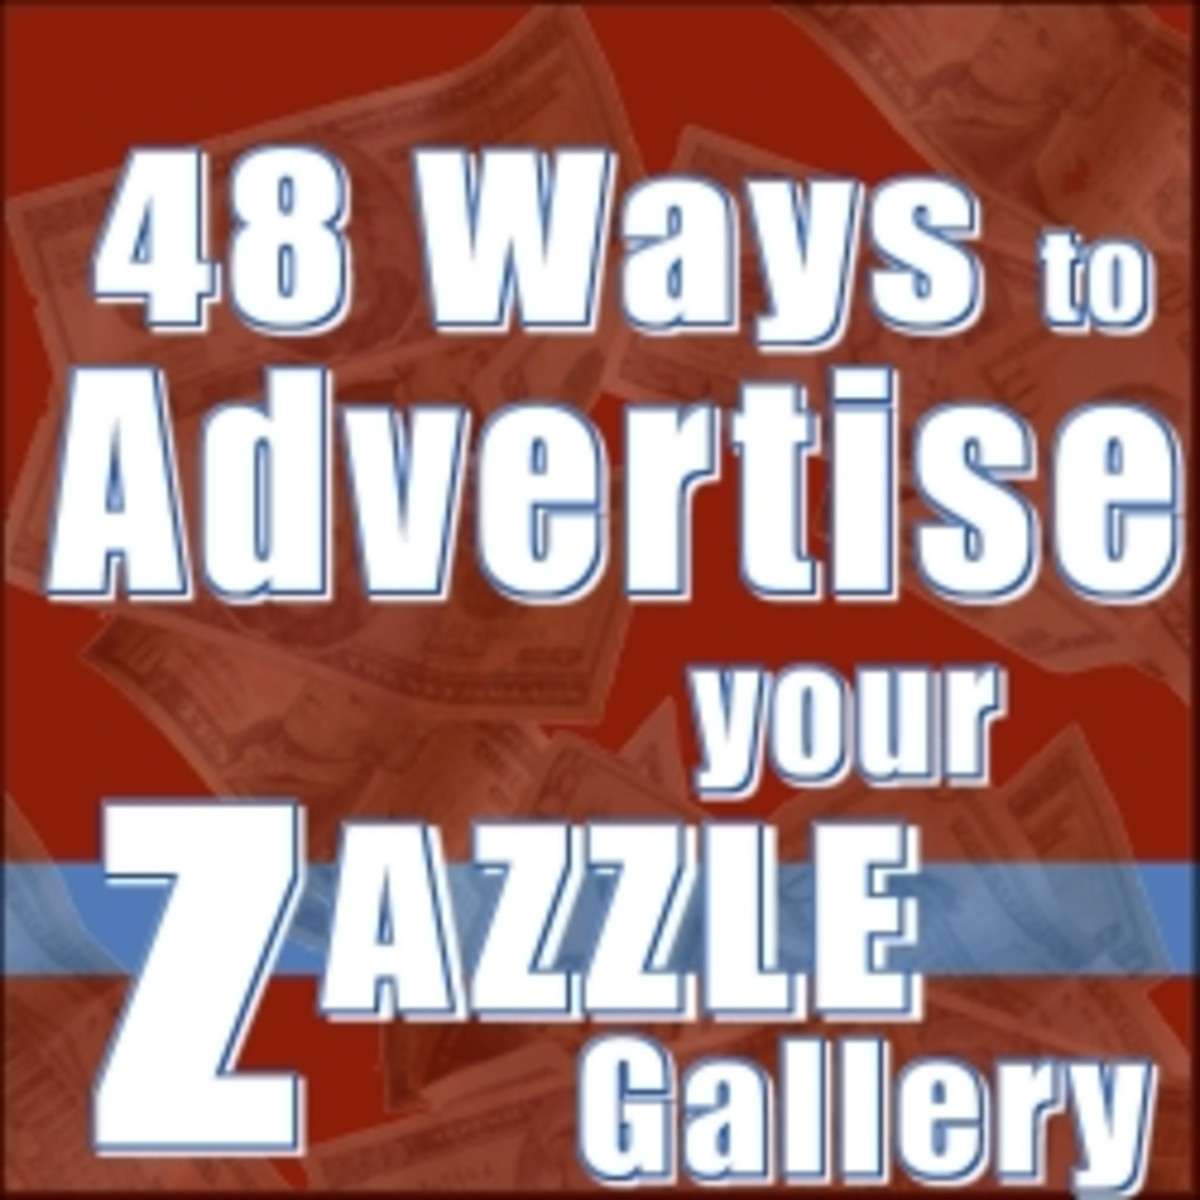 zazzle-gallery-promotion